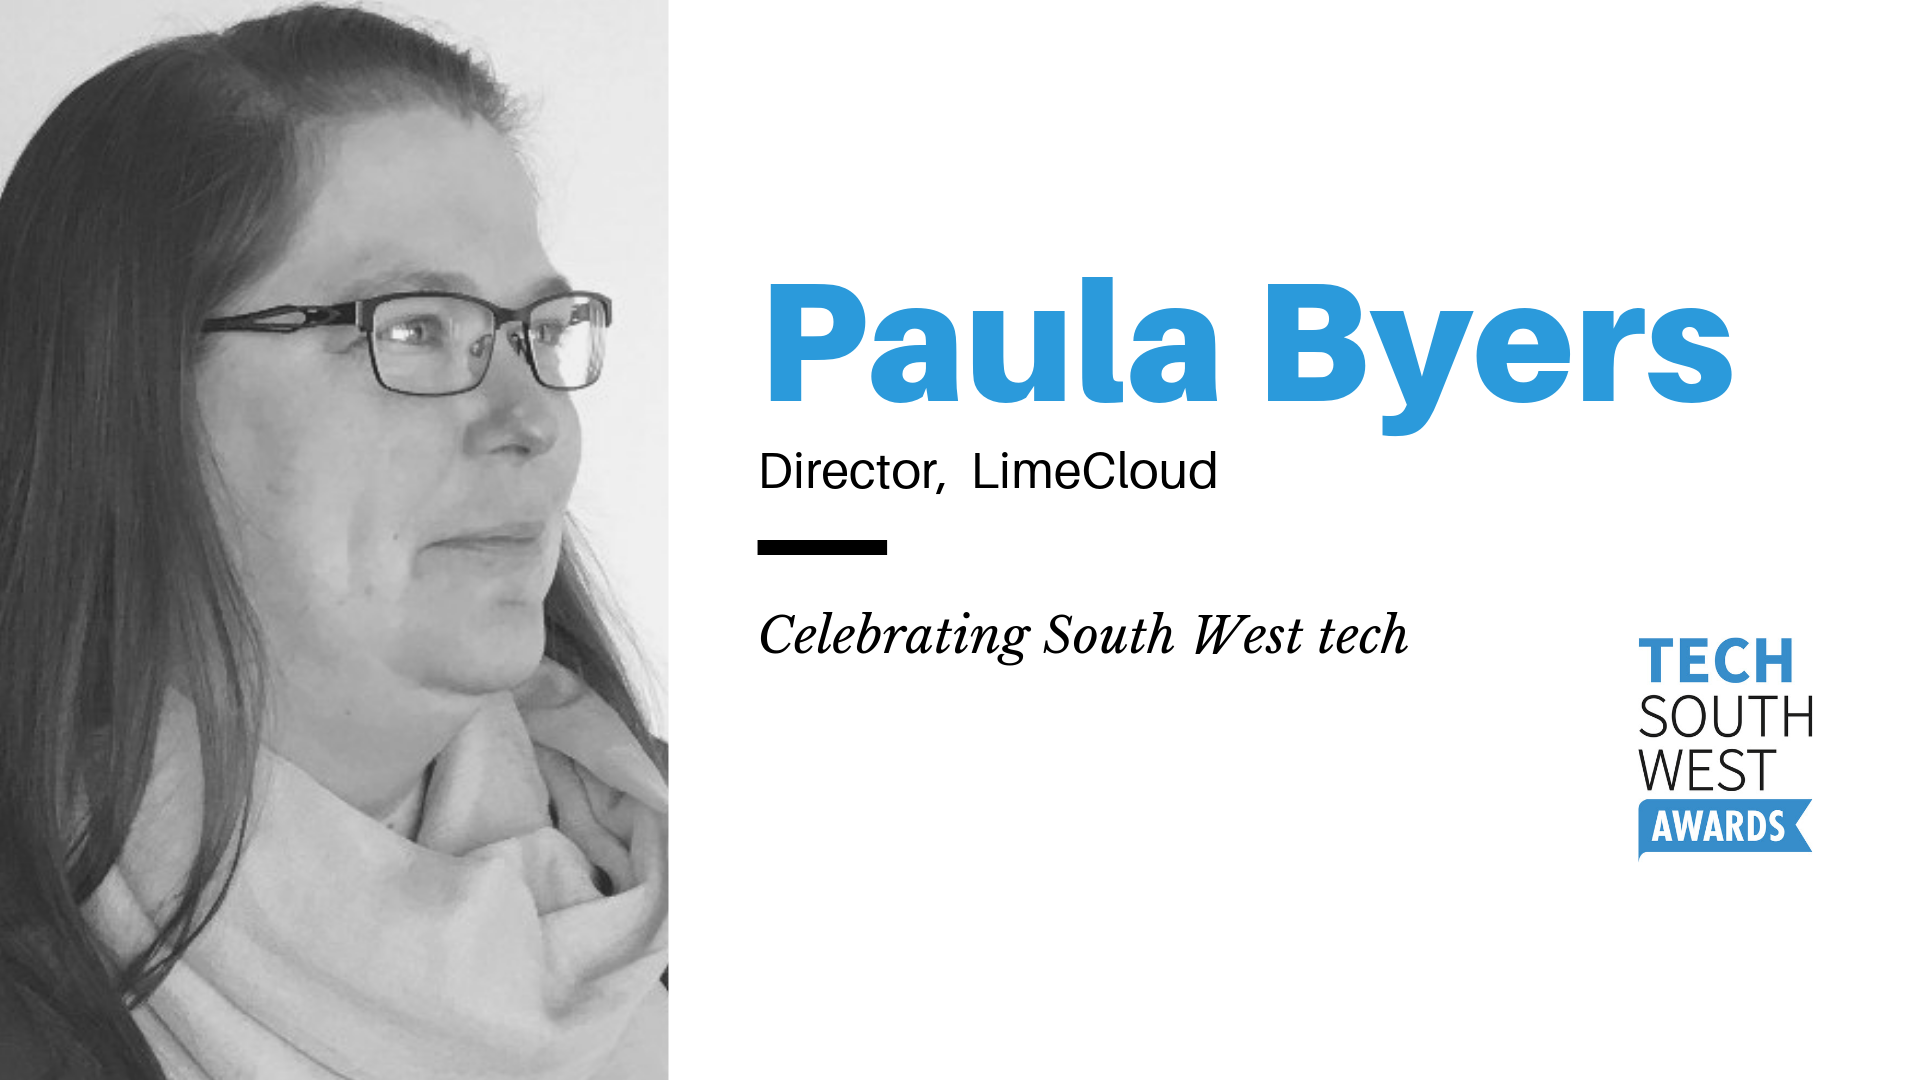 From Entrepreneurial Spirit to Inclusivity: Paula Byers Talks Tech